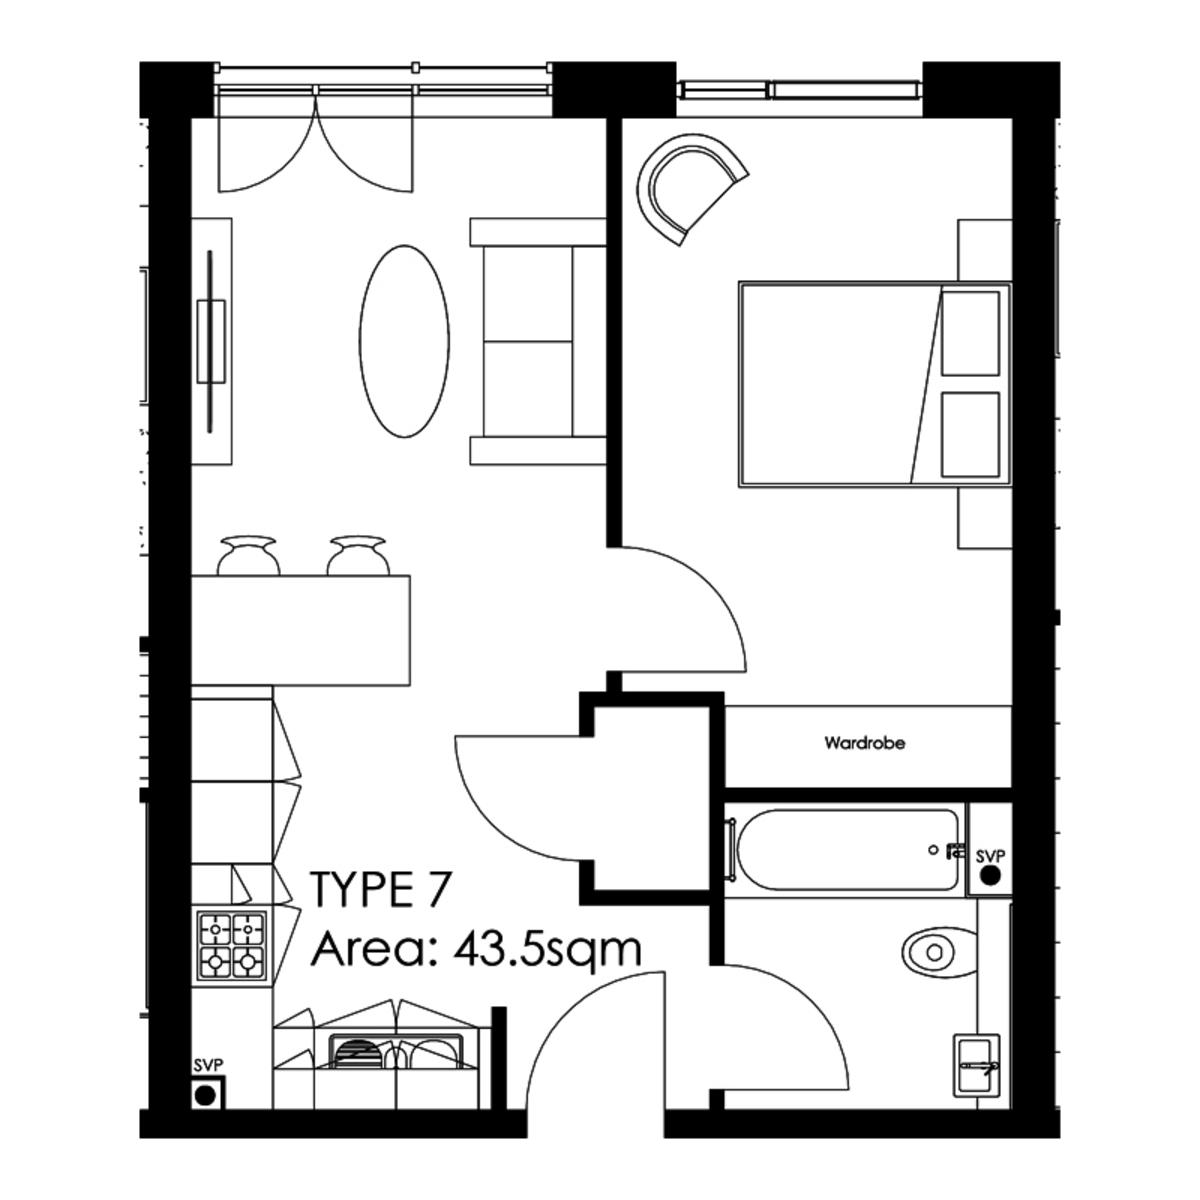 The Axium, Windmill Street, Birmingham City Centre floorplan 1 of 1